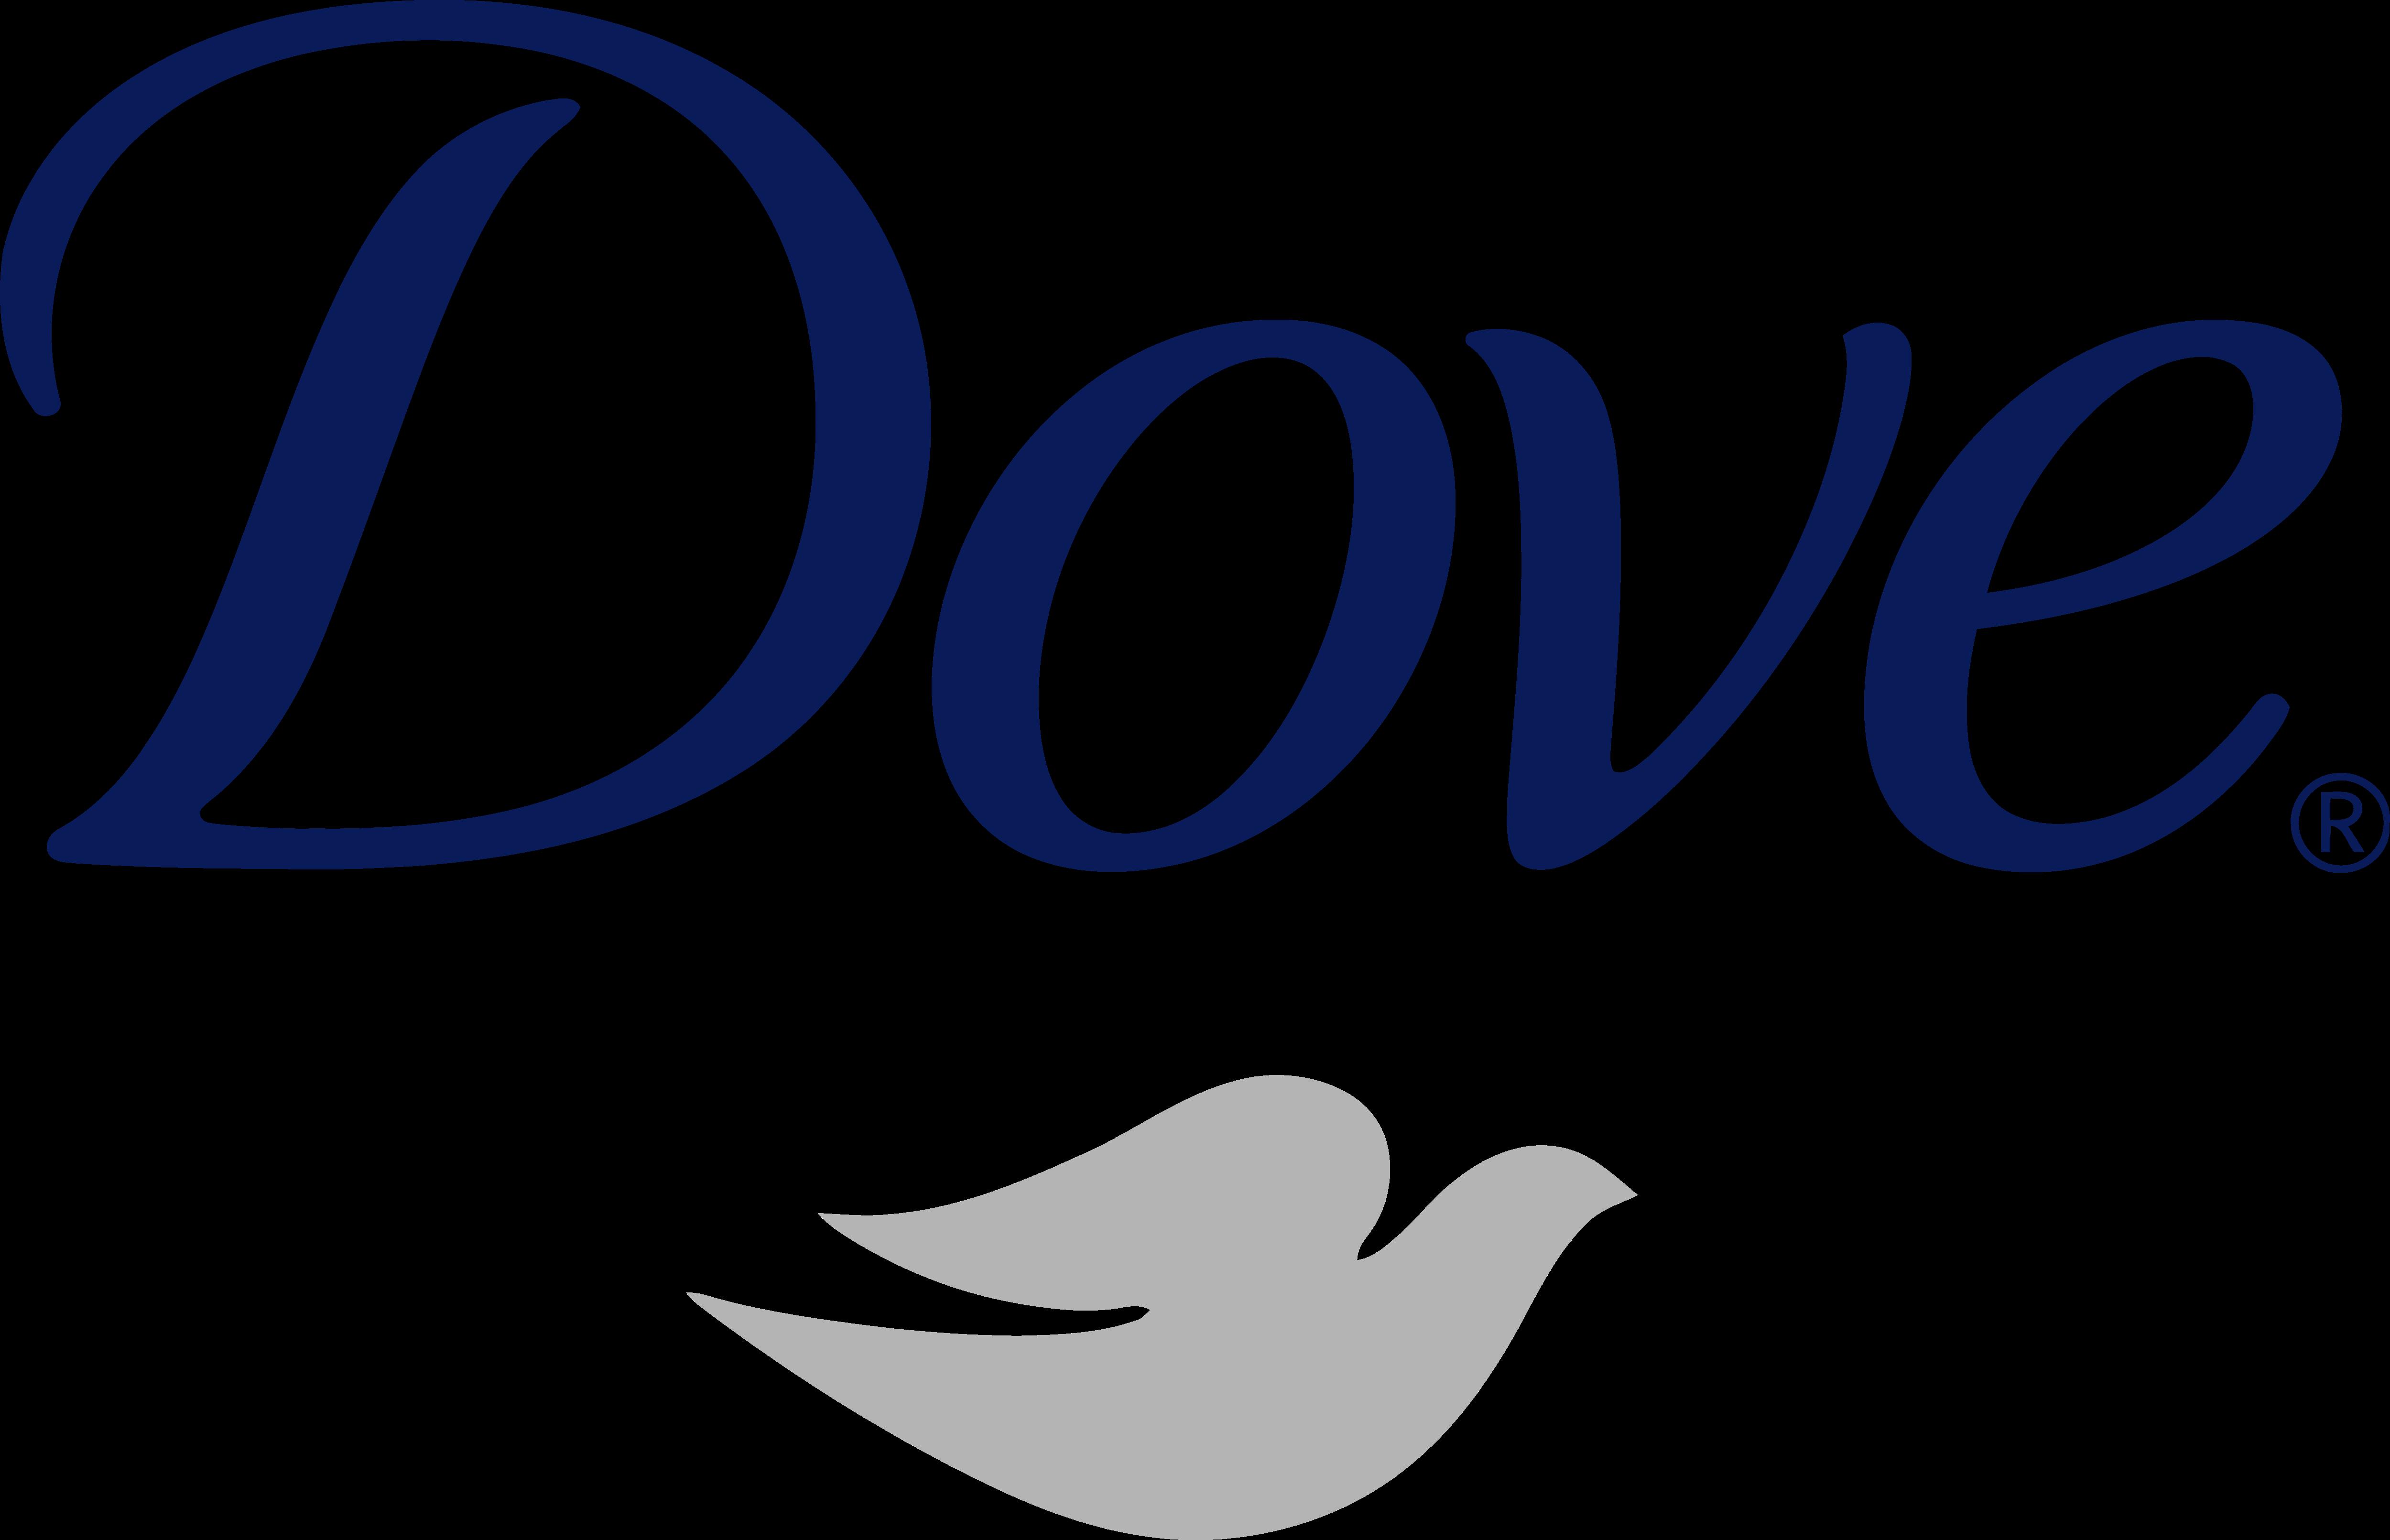 dove � logos download